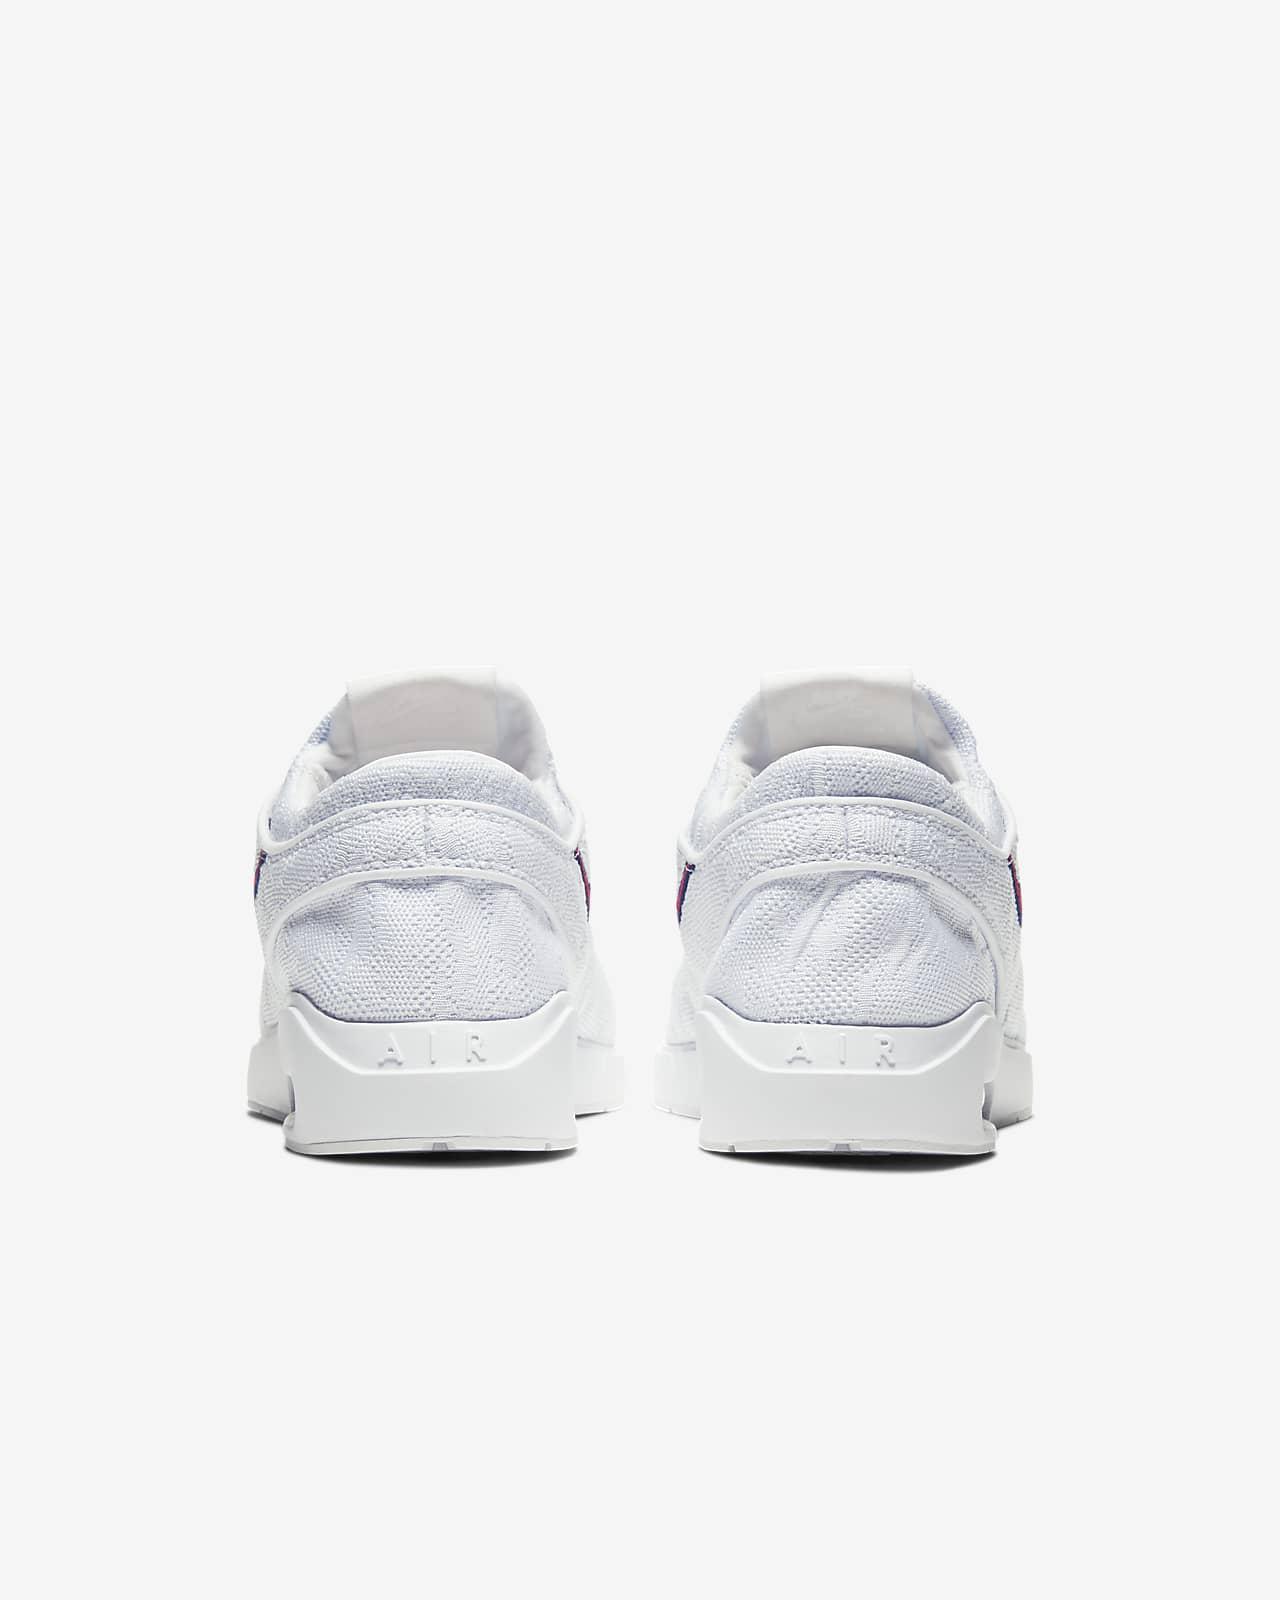 Running Shoes Skate Sneakers Men Size 10 *NEW* Nike SB Stefan Janoski Air Max